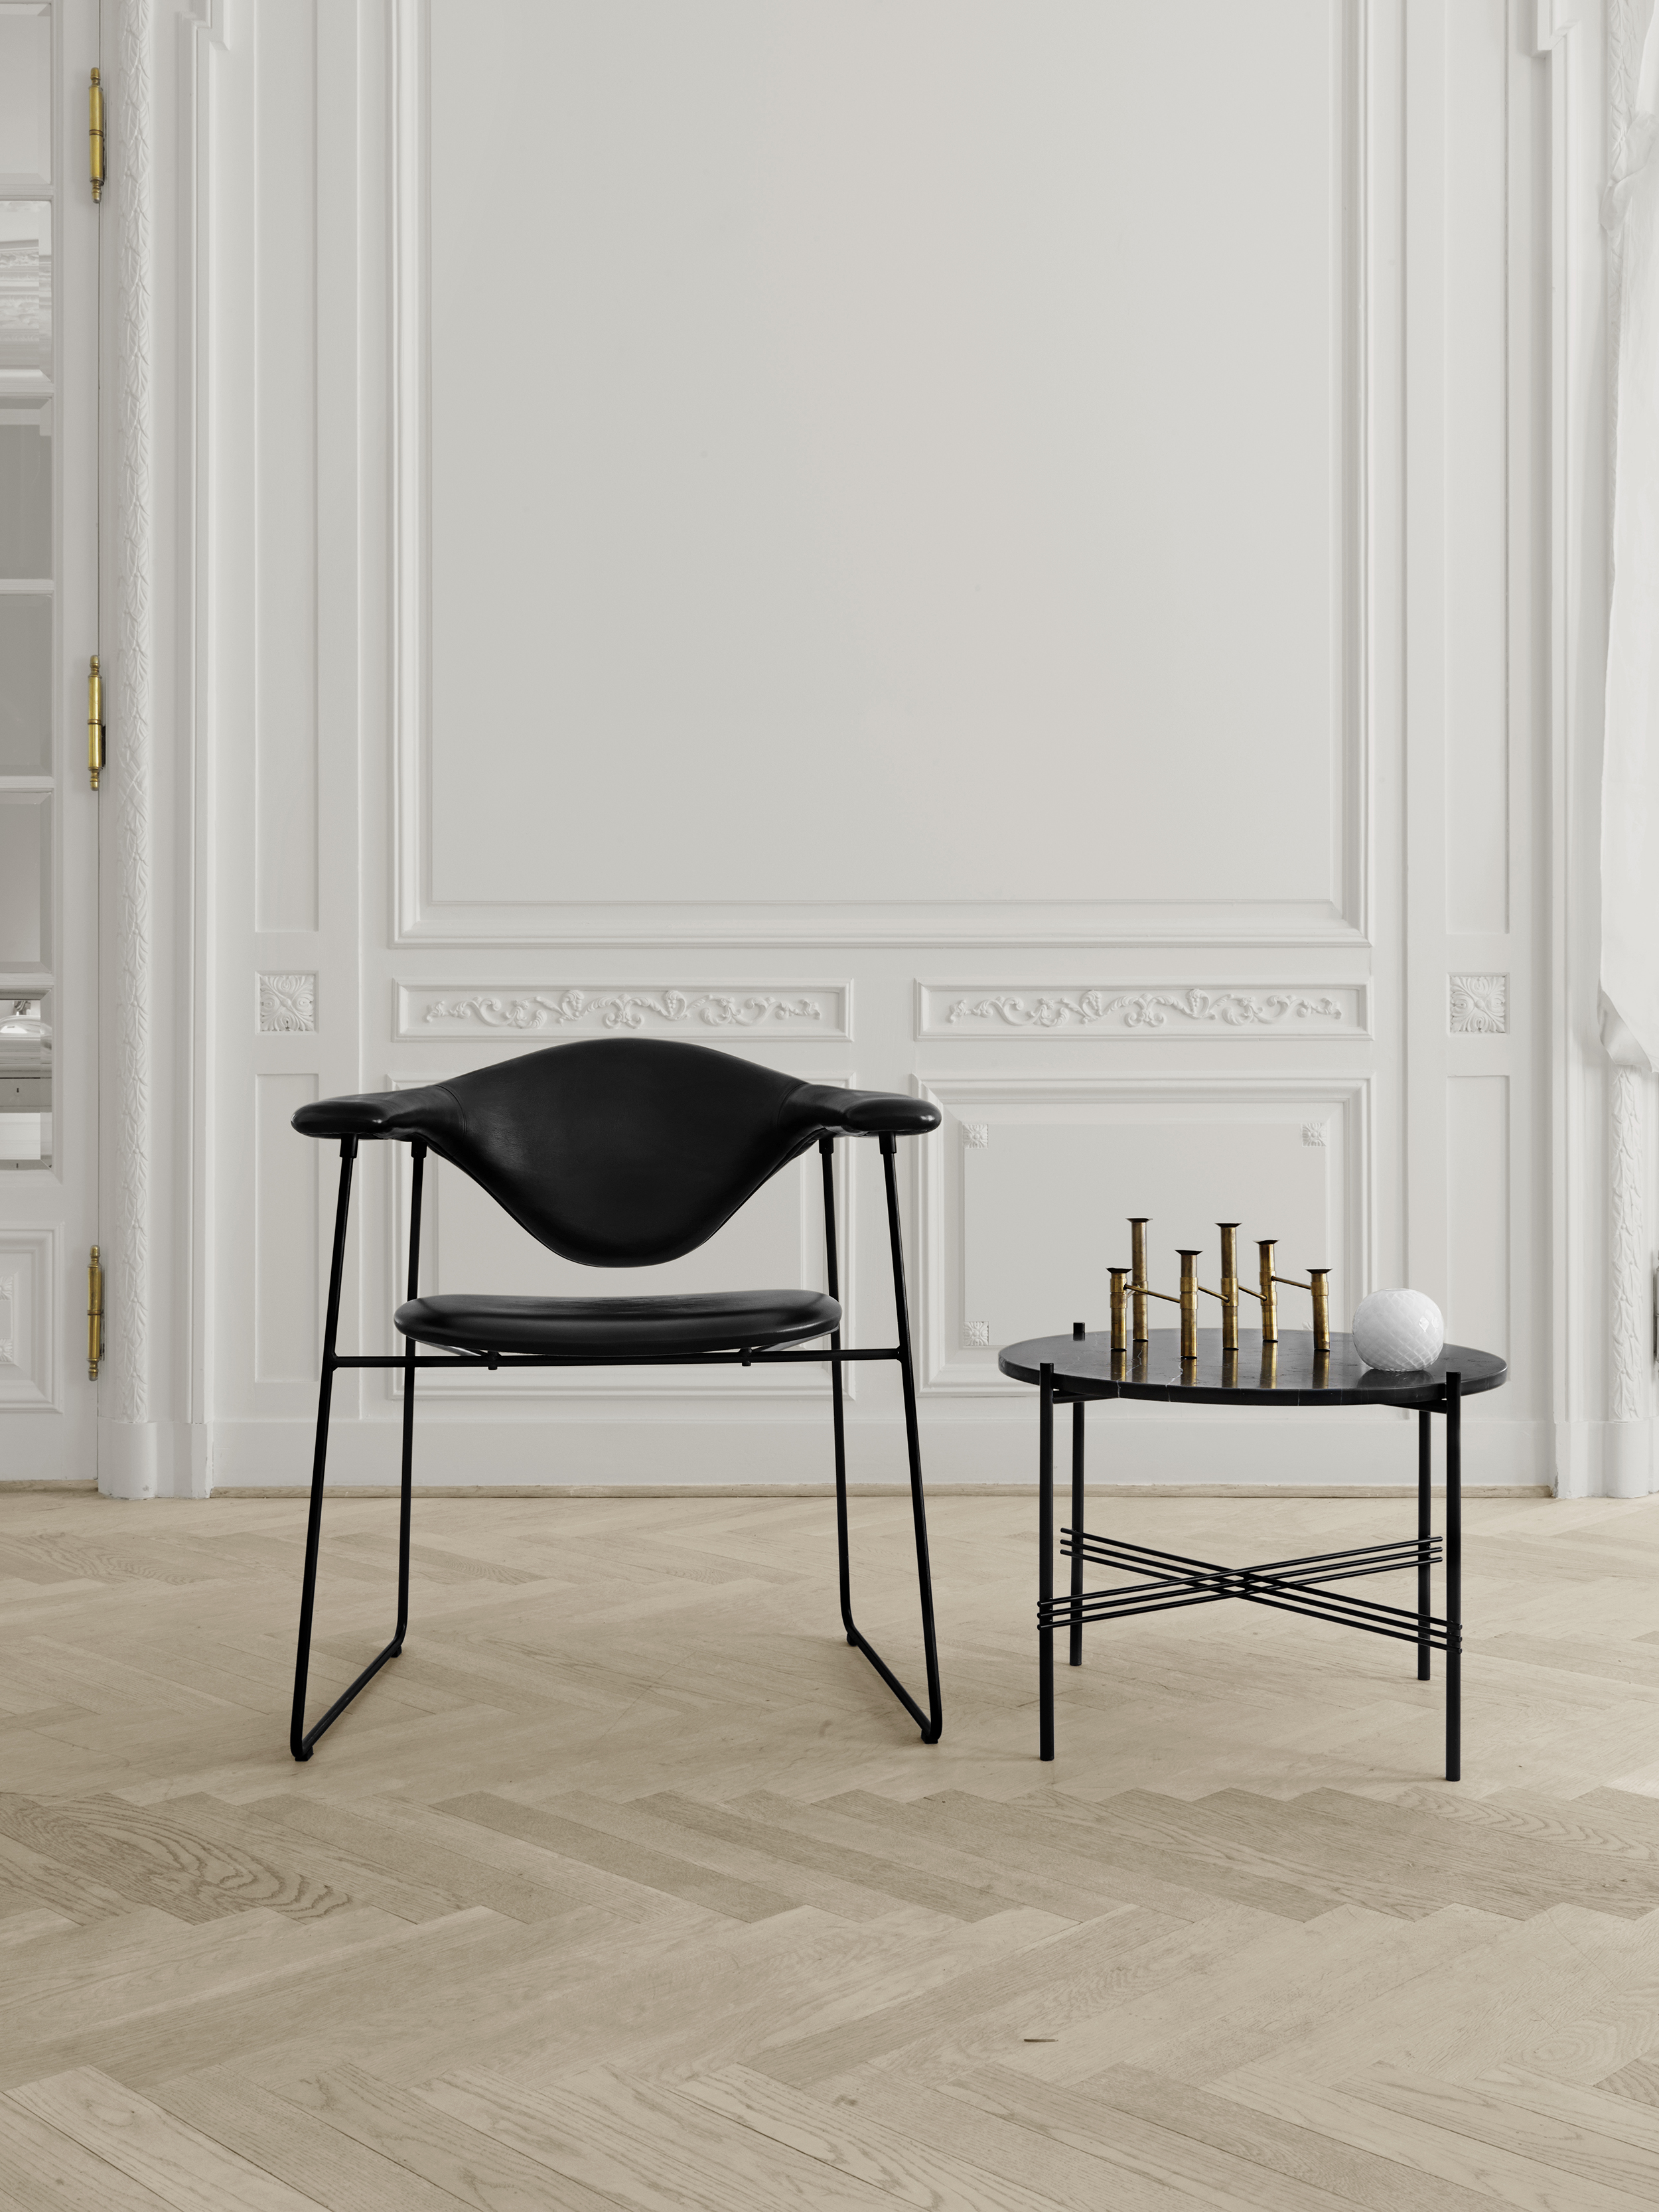 Name :Masculo dining chair / Designer :GamFratesi, 2008